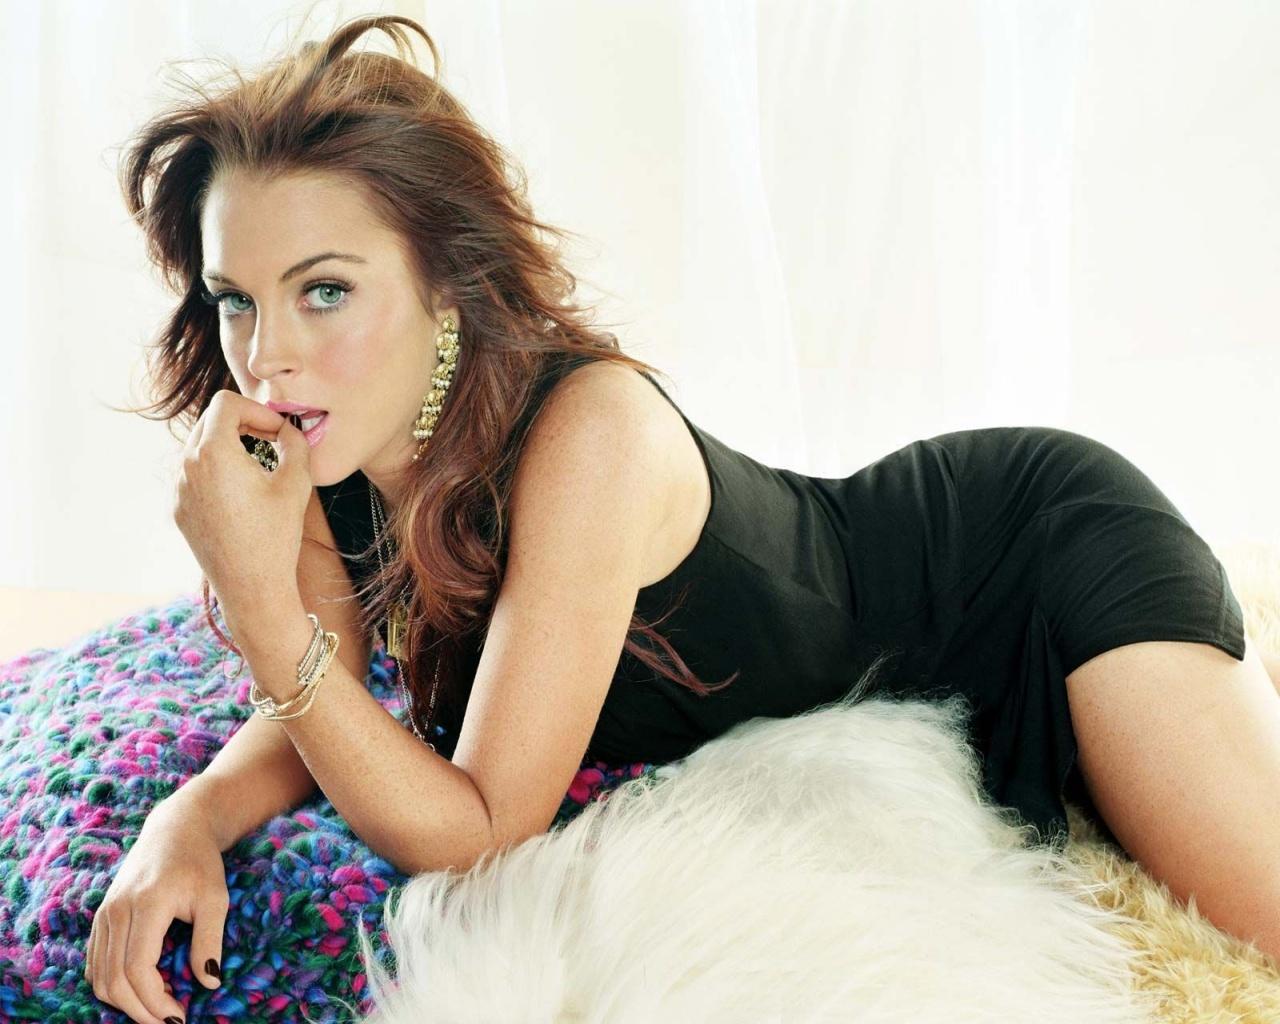 http://3.bp.blogspot.com/-UaS8p4jrWNI/UO-If4abwVI/AAAAAAAAHZs/D9ny53X8jFk/s1600/Lindsay+Lohan+1.jpg